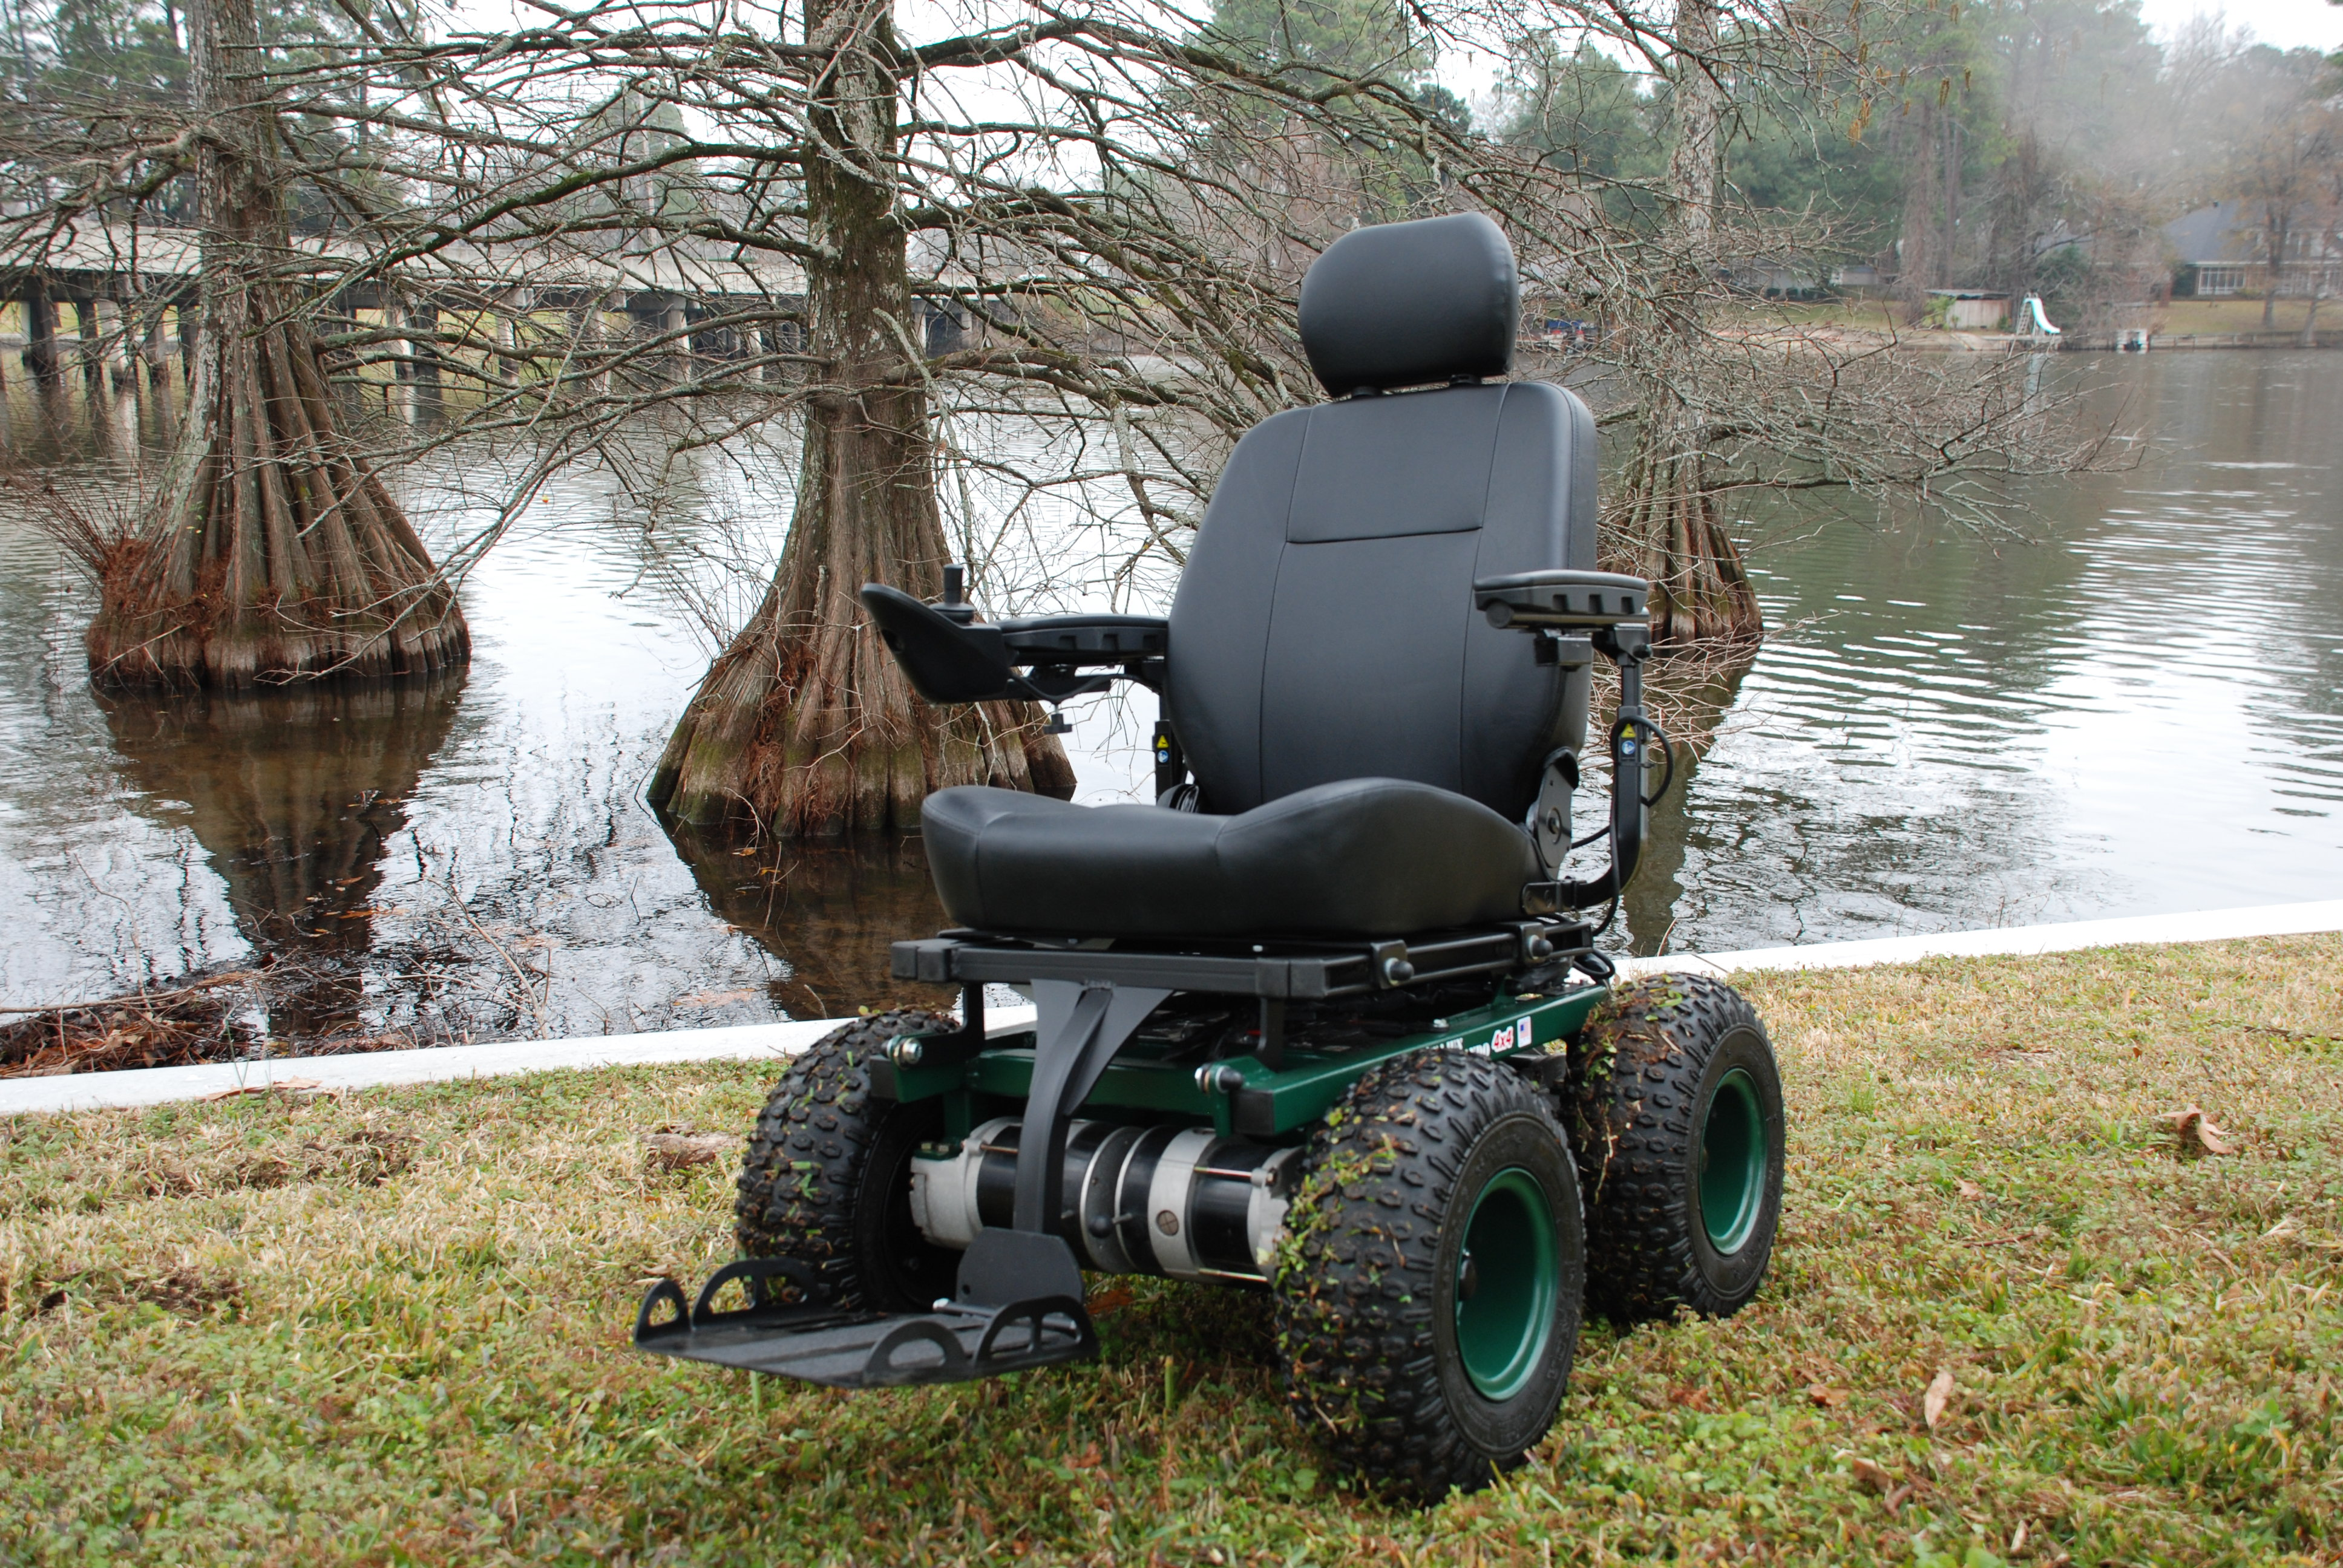 Cajun mobility personal all terrain 4x4 vehicle - Sillas ruedas electricas usadas ...